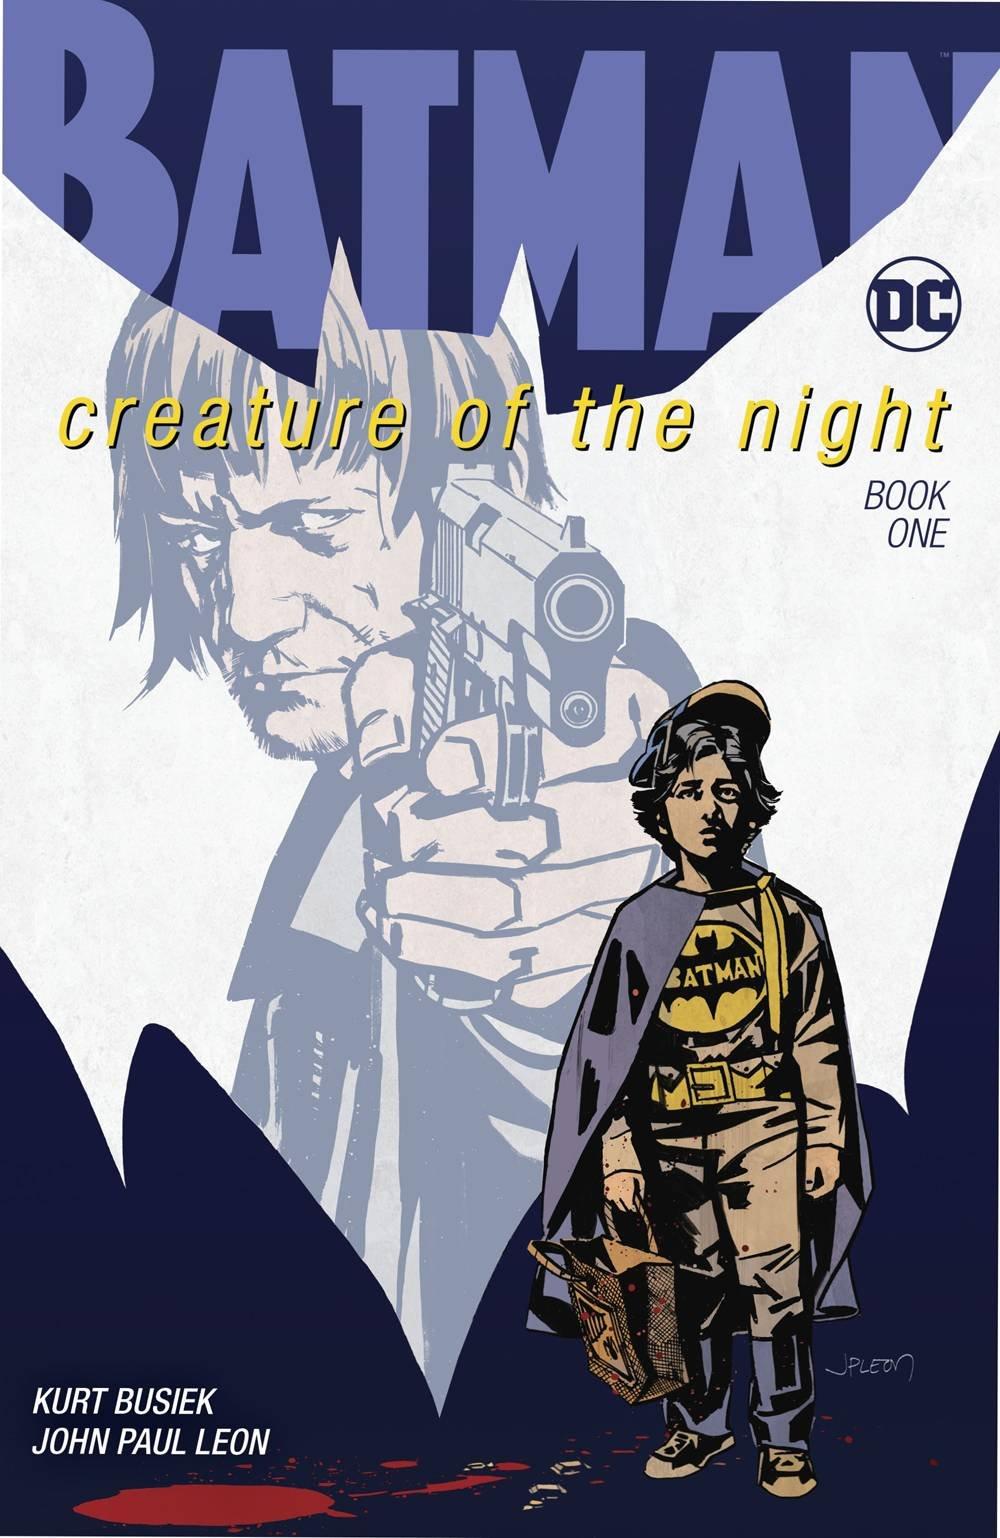 BATMAN: CREATURE OF THE NIGHT (MS 4)